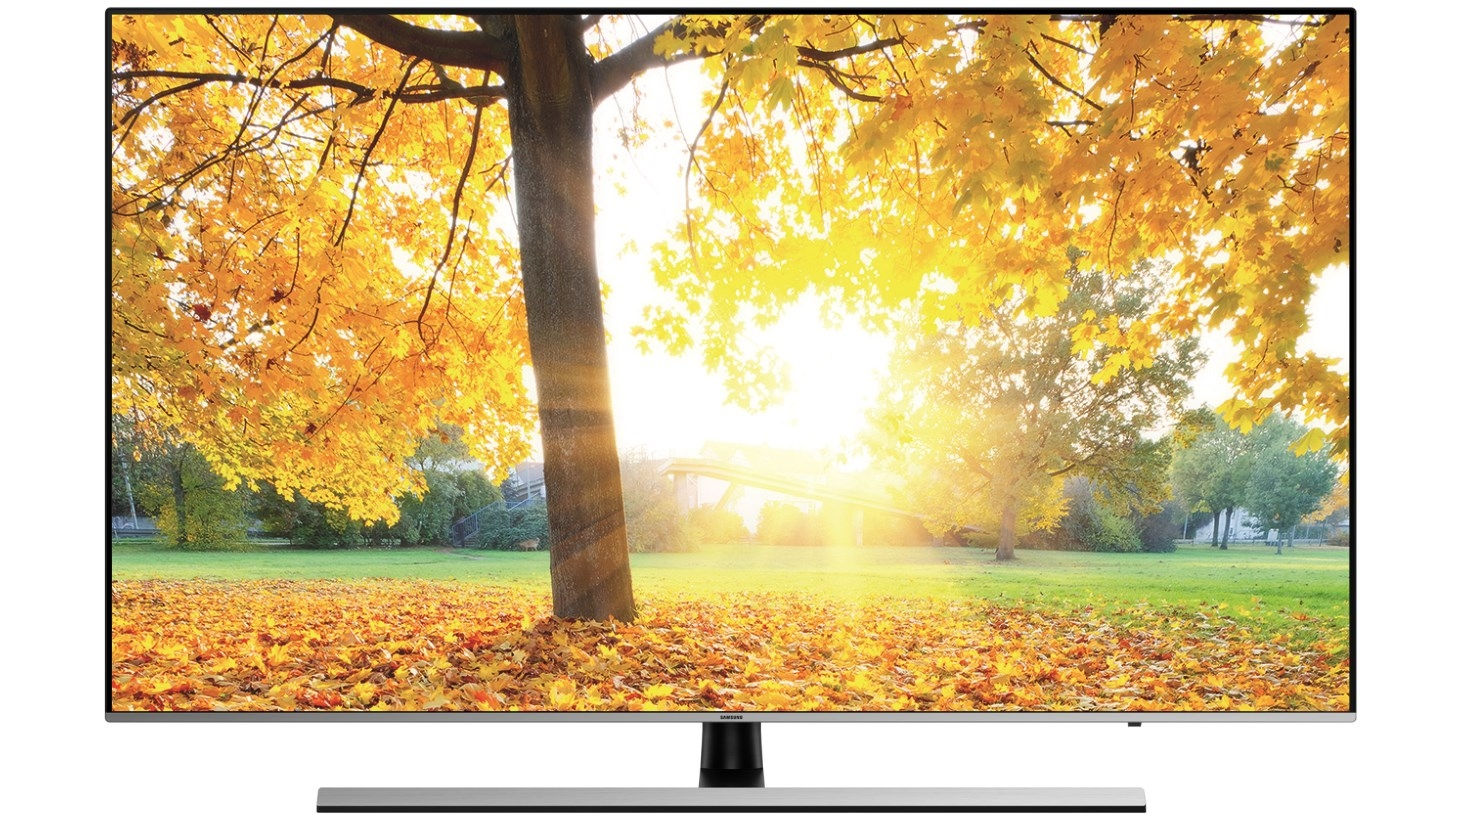 078689f67 Buy Samsung 55-inch NU8000 Premium 4K UHD LED LCD Smart TV